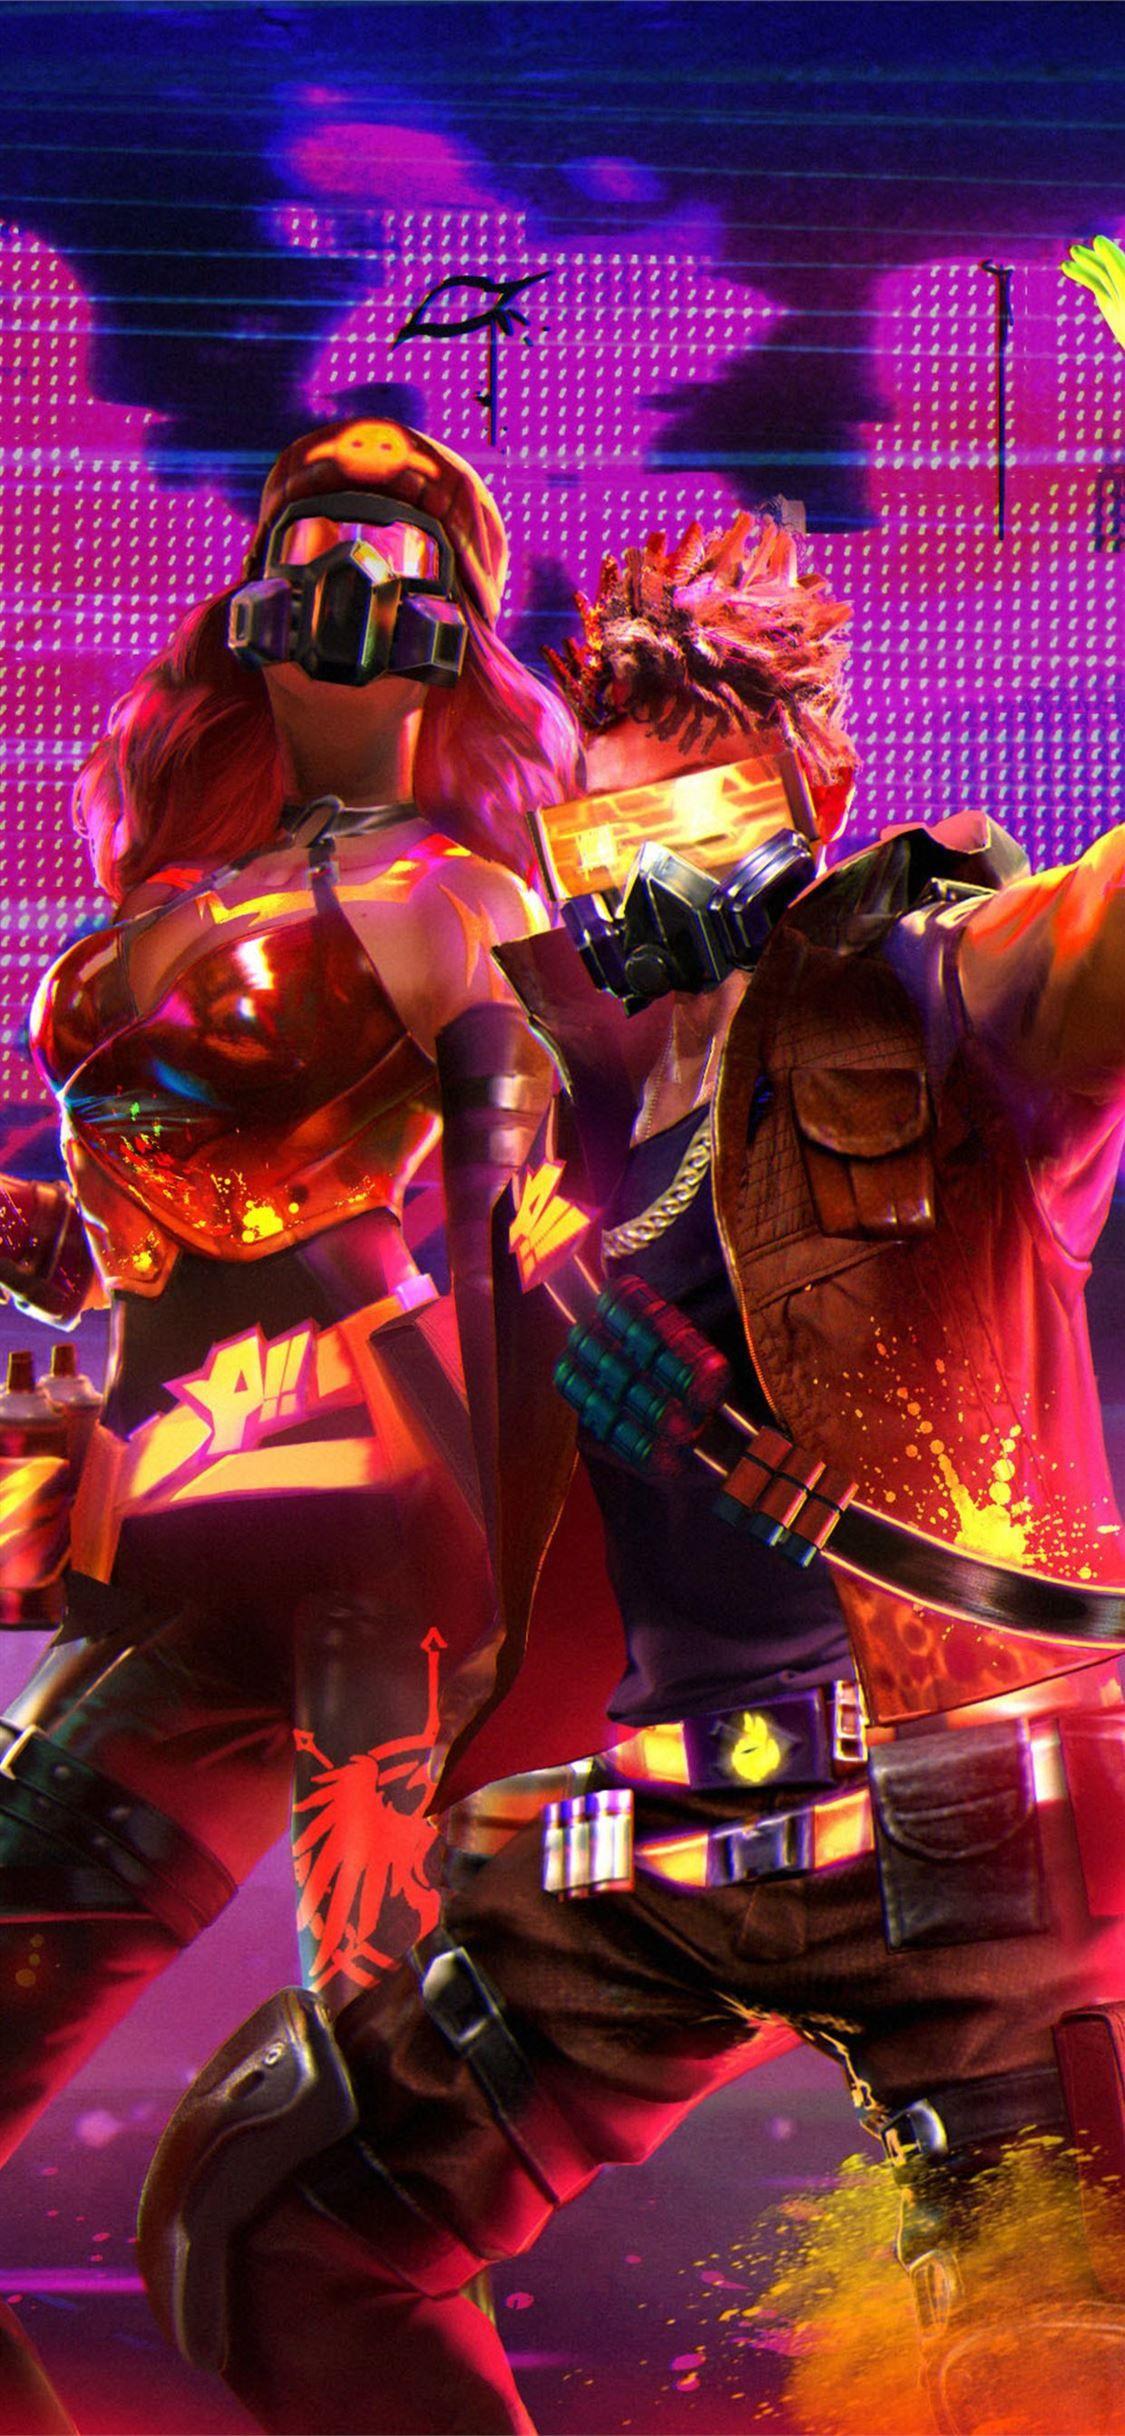 Garena Free Fire 4k Game 2020games Games 4k Iphonexwallpaper In 2020 Fire Image Dark Wallpaper Iphone Wallpaper Free Download